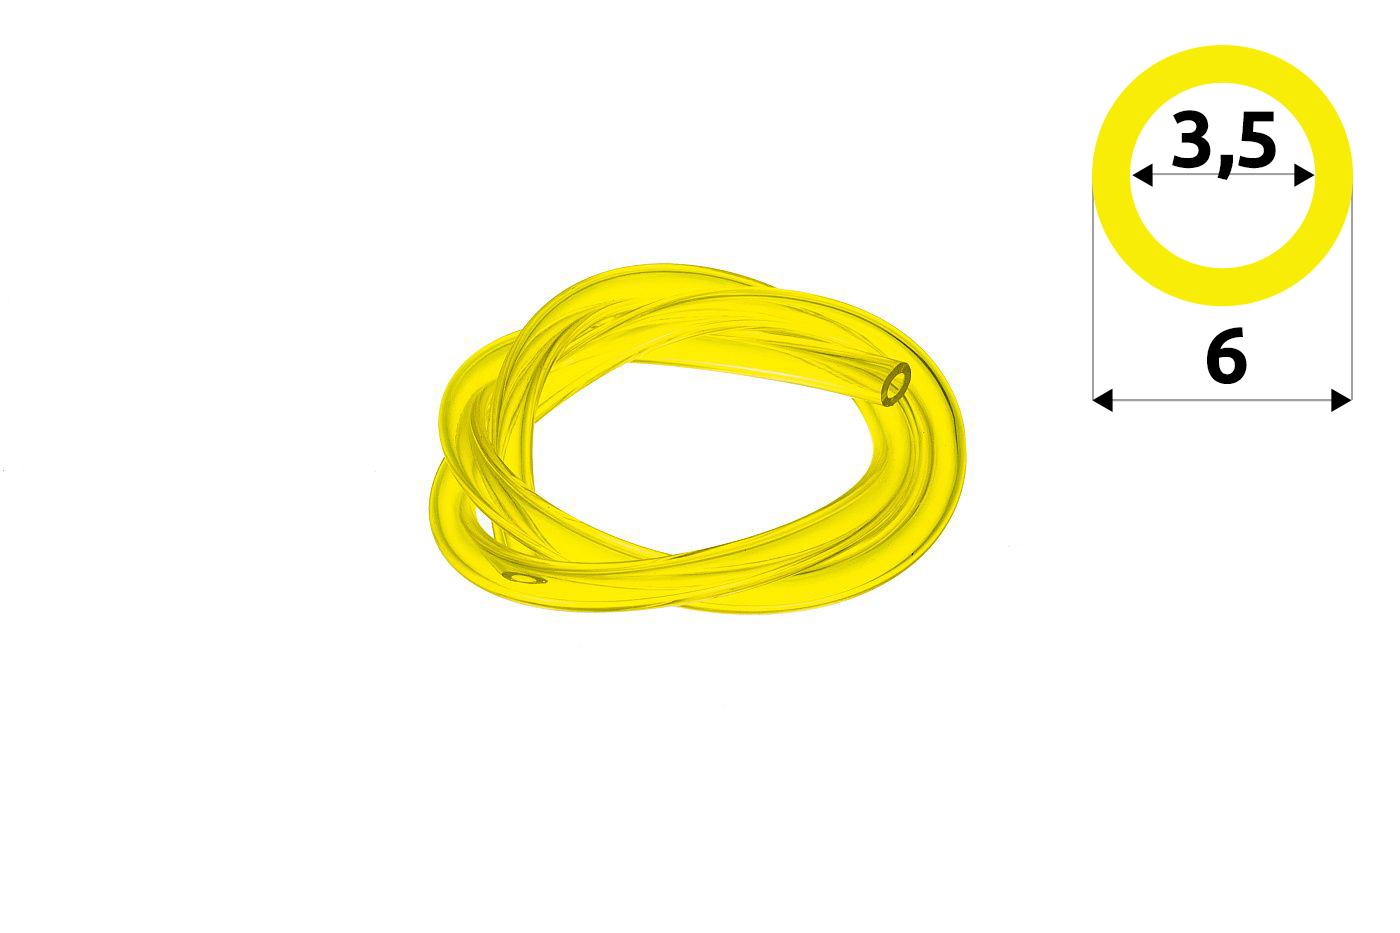 Palivová hadička 3,5 mm x 6,0 mm - 1 meter